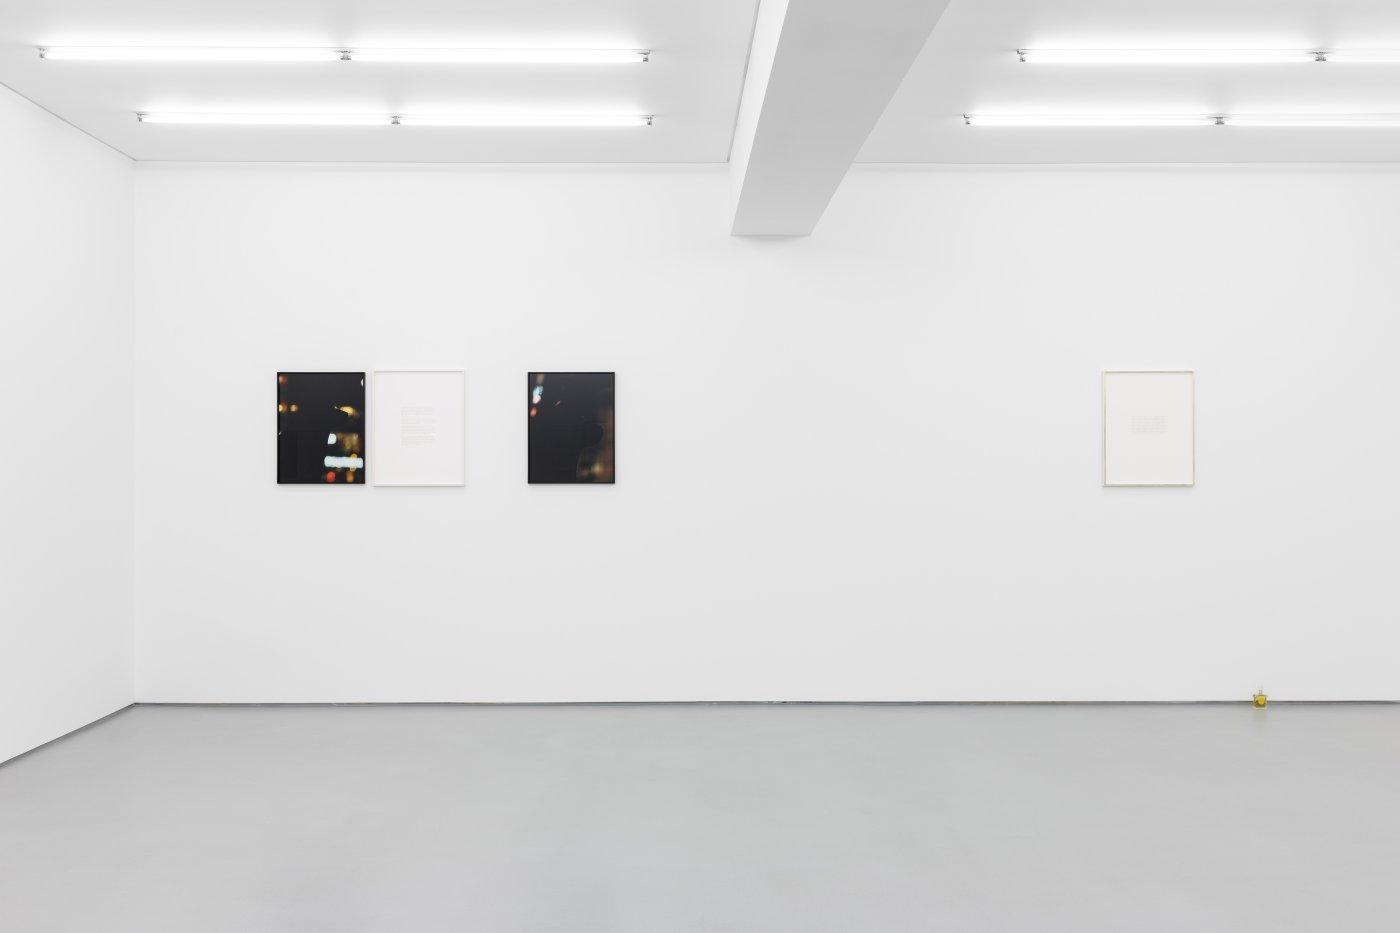 Exhibition view:Portraits (and so castles made of sand melt into the sea eventually), Daniel Gustav Cramer, Galeria Vera Cortês, 2021